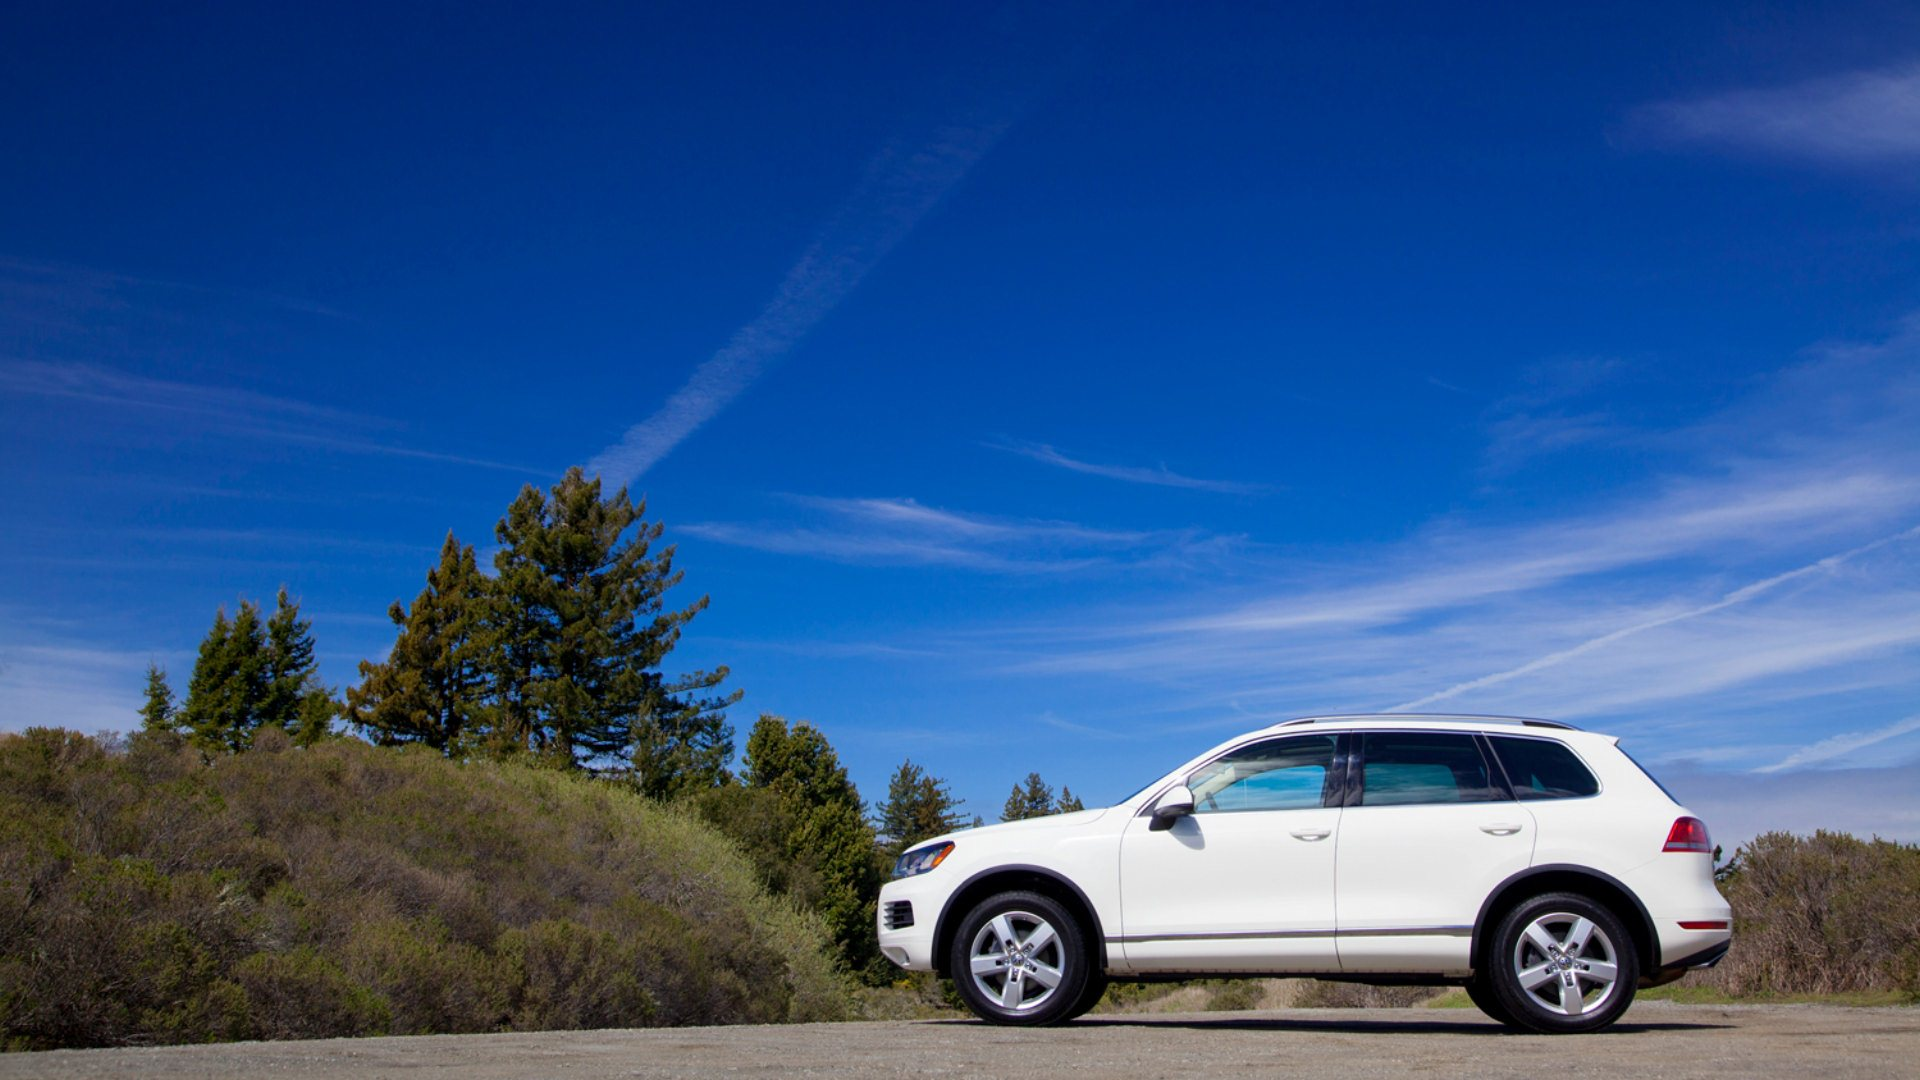 Volkswagen Touareg wallpapers white